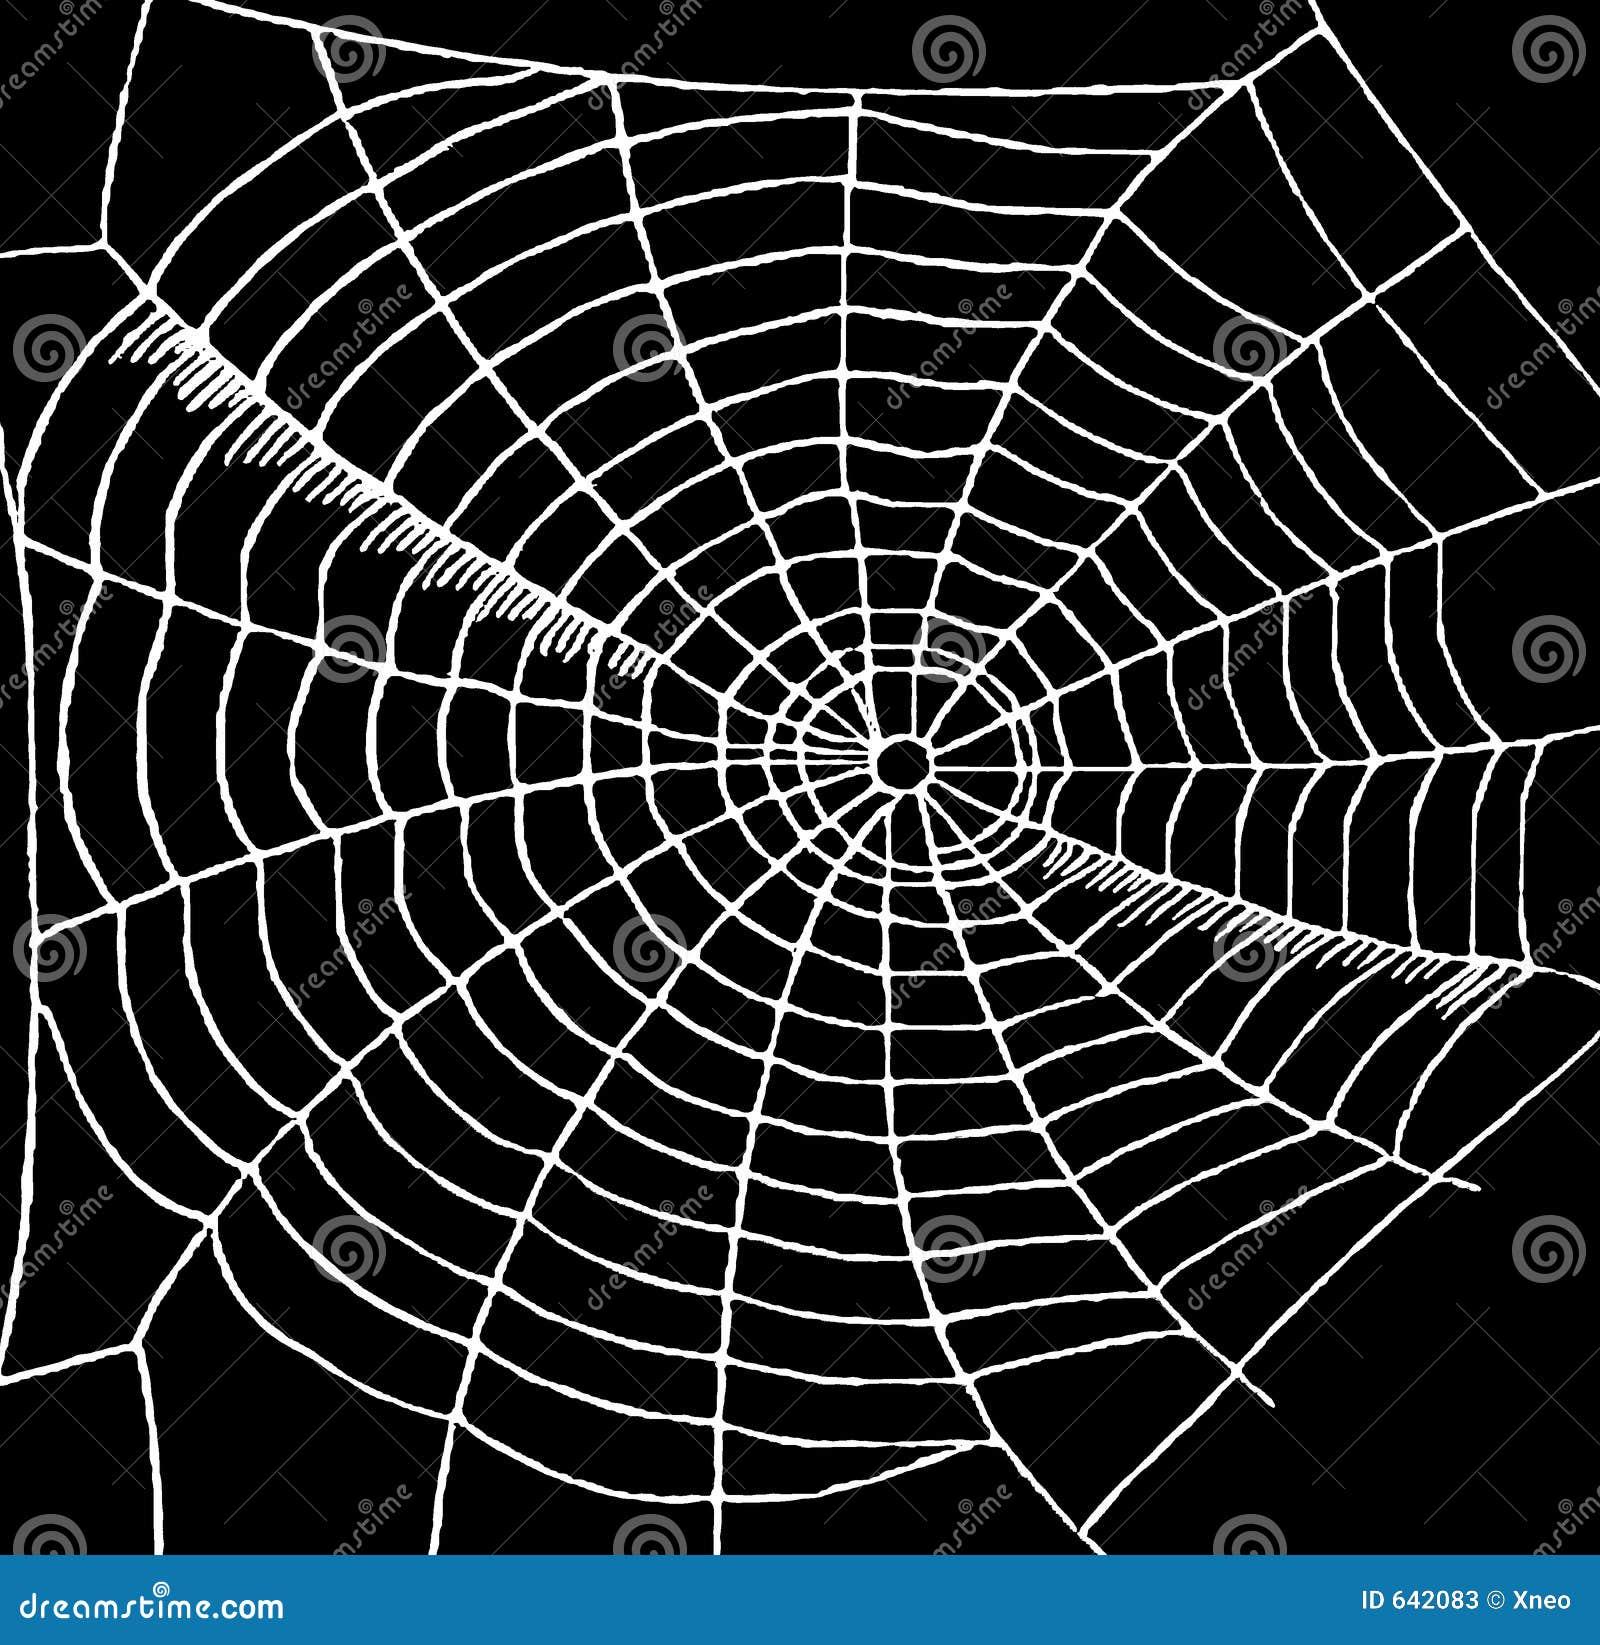 Spiderweb Stock Photos - Image: 642083 Vector Spider Web Design